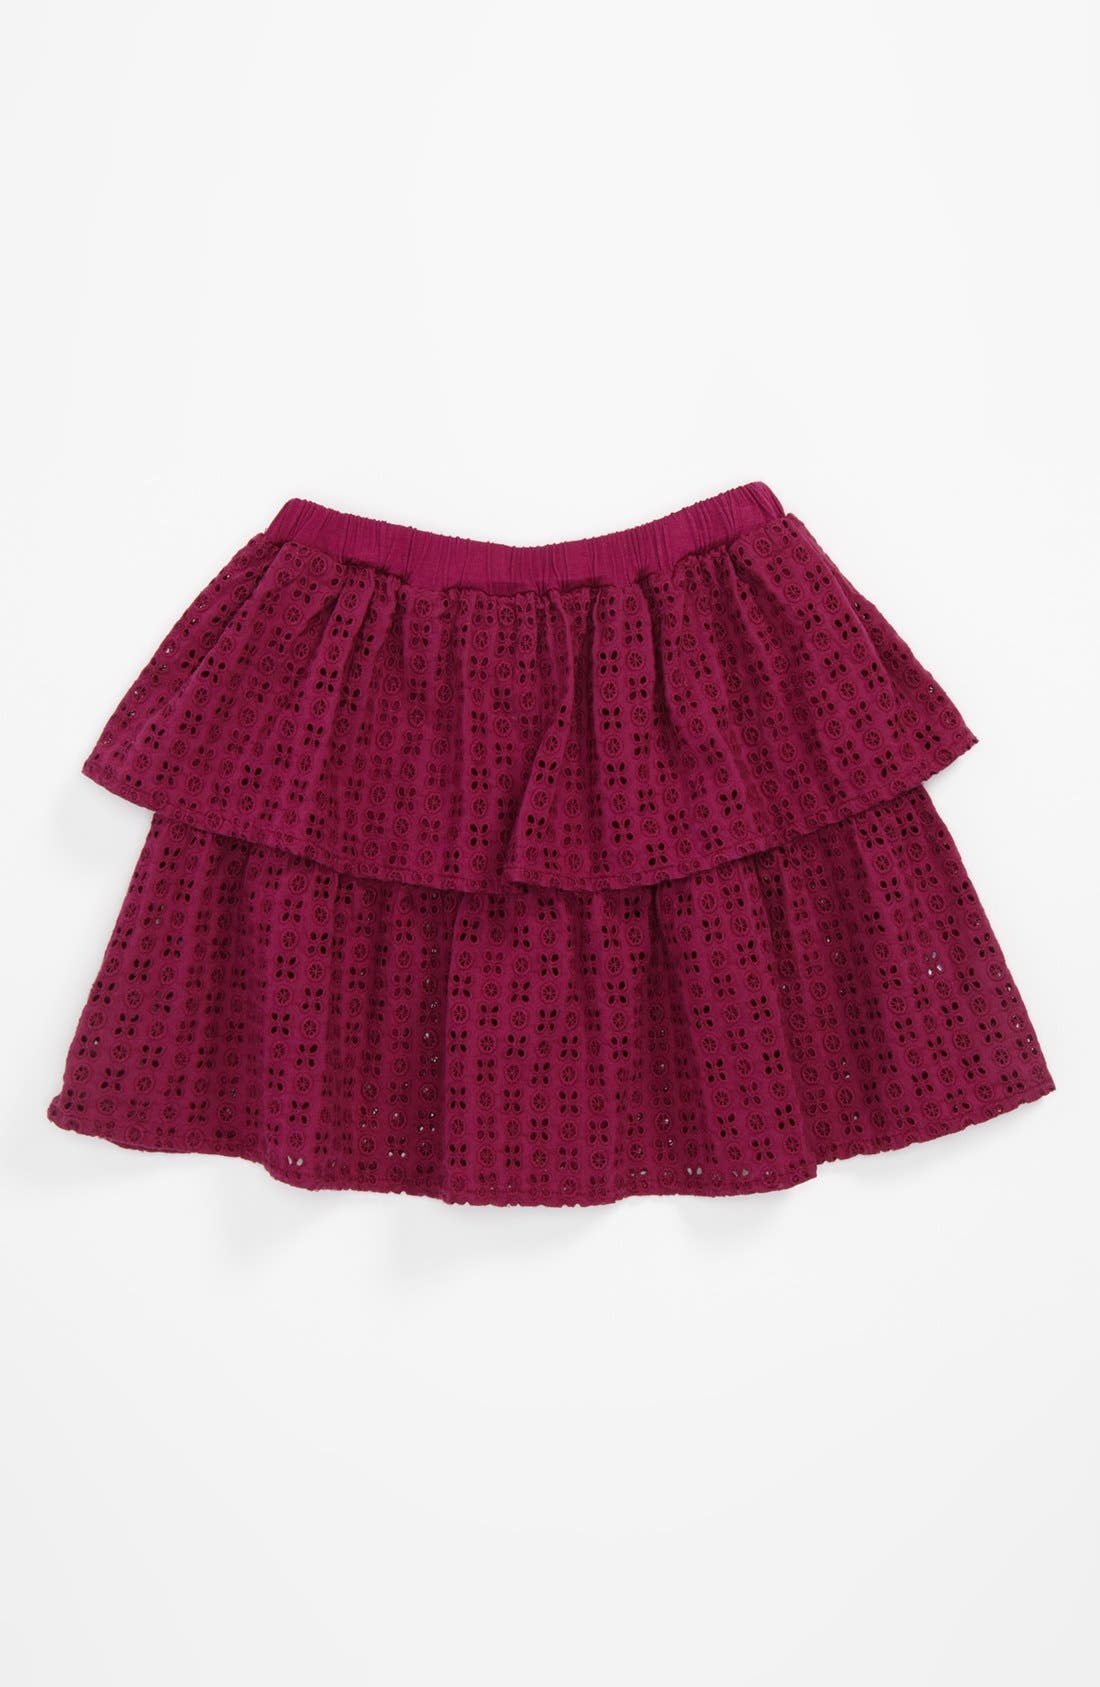 Alternate Image 1 Selected - Peek 'Catalina' Skirt (Toddler, Little Girls & Big Girls)